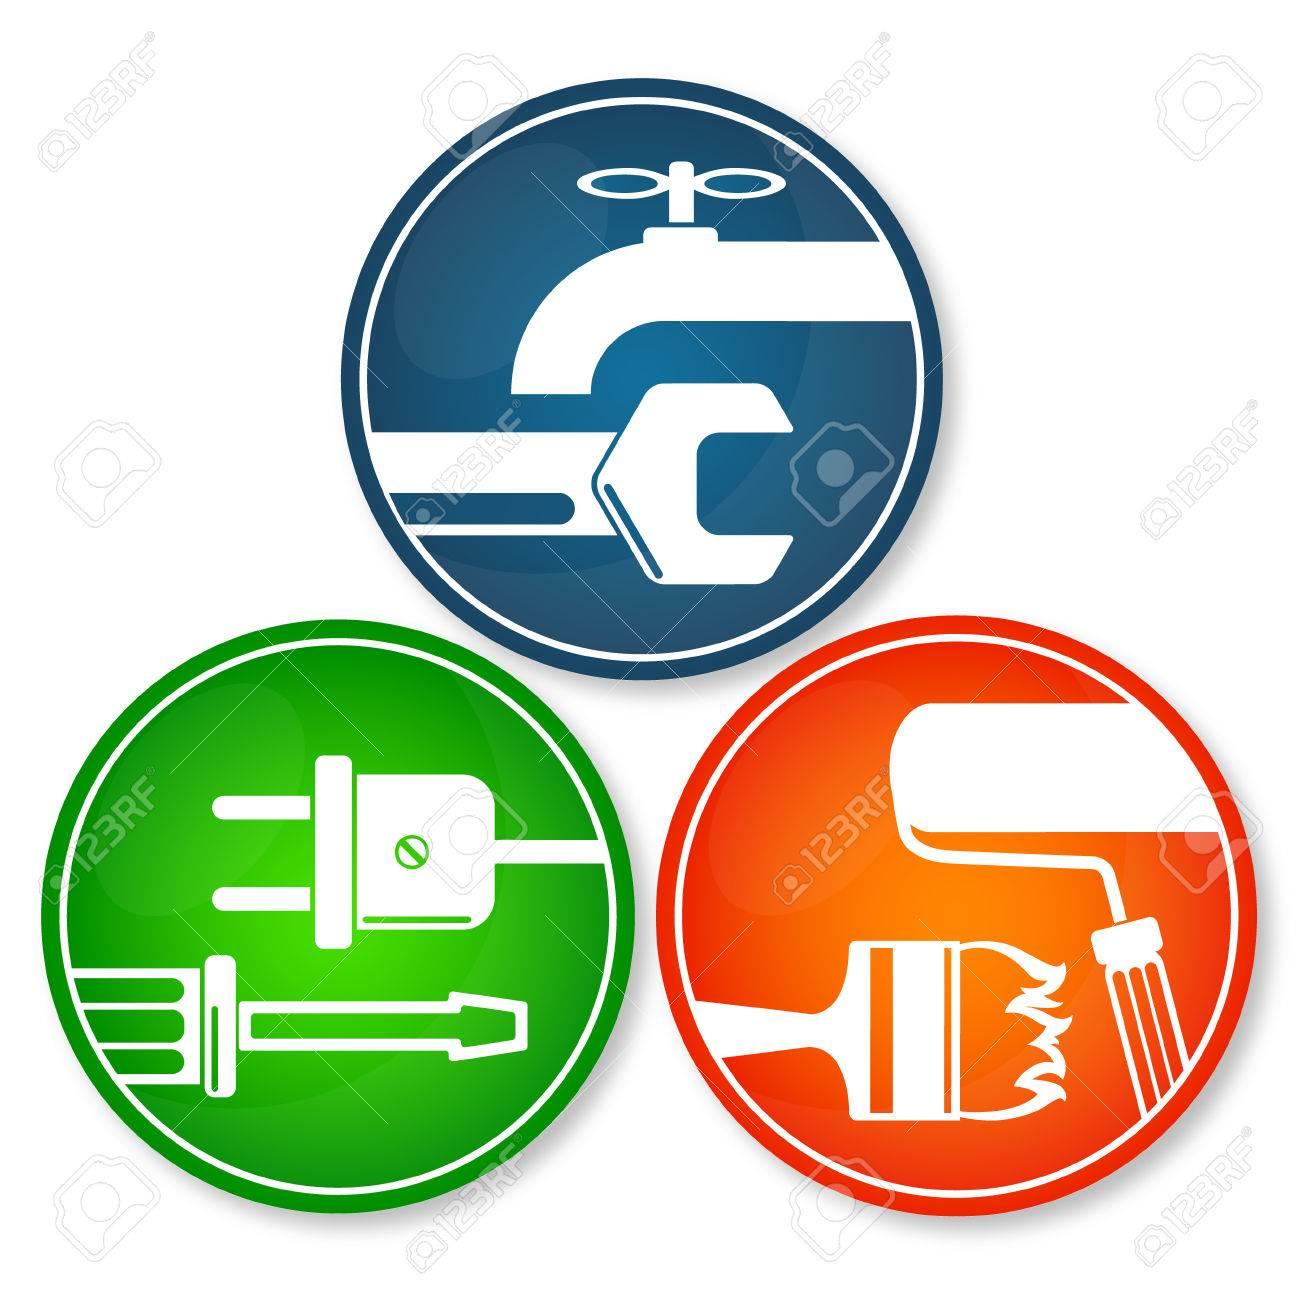 Set of symbols for home renovation repair tool royalty free set of symbols for home renovation repair tool stock vector 49597483 buycottarizona